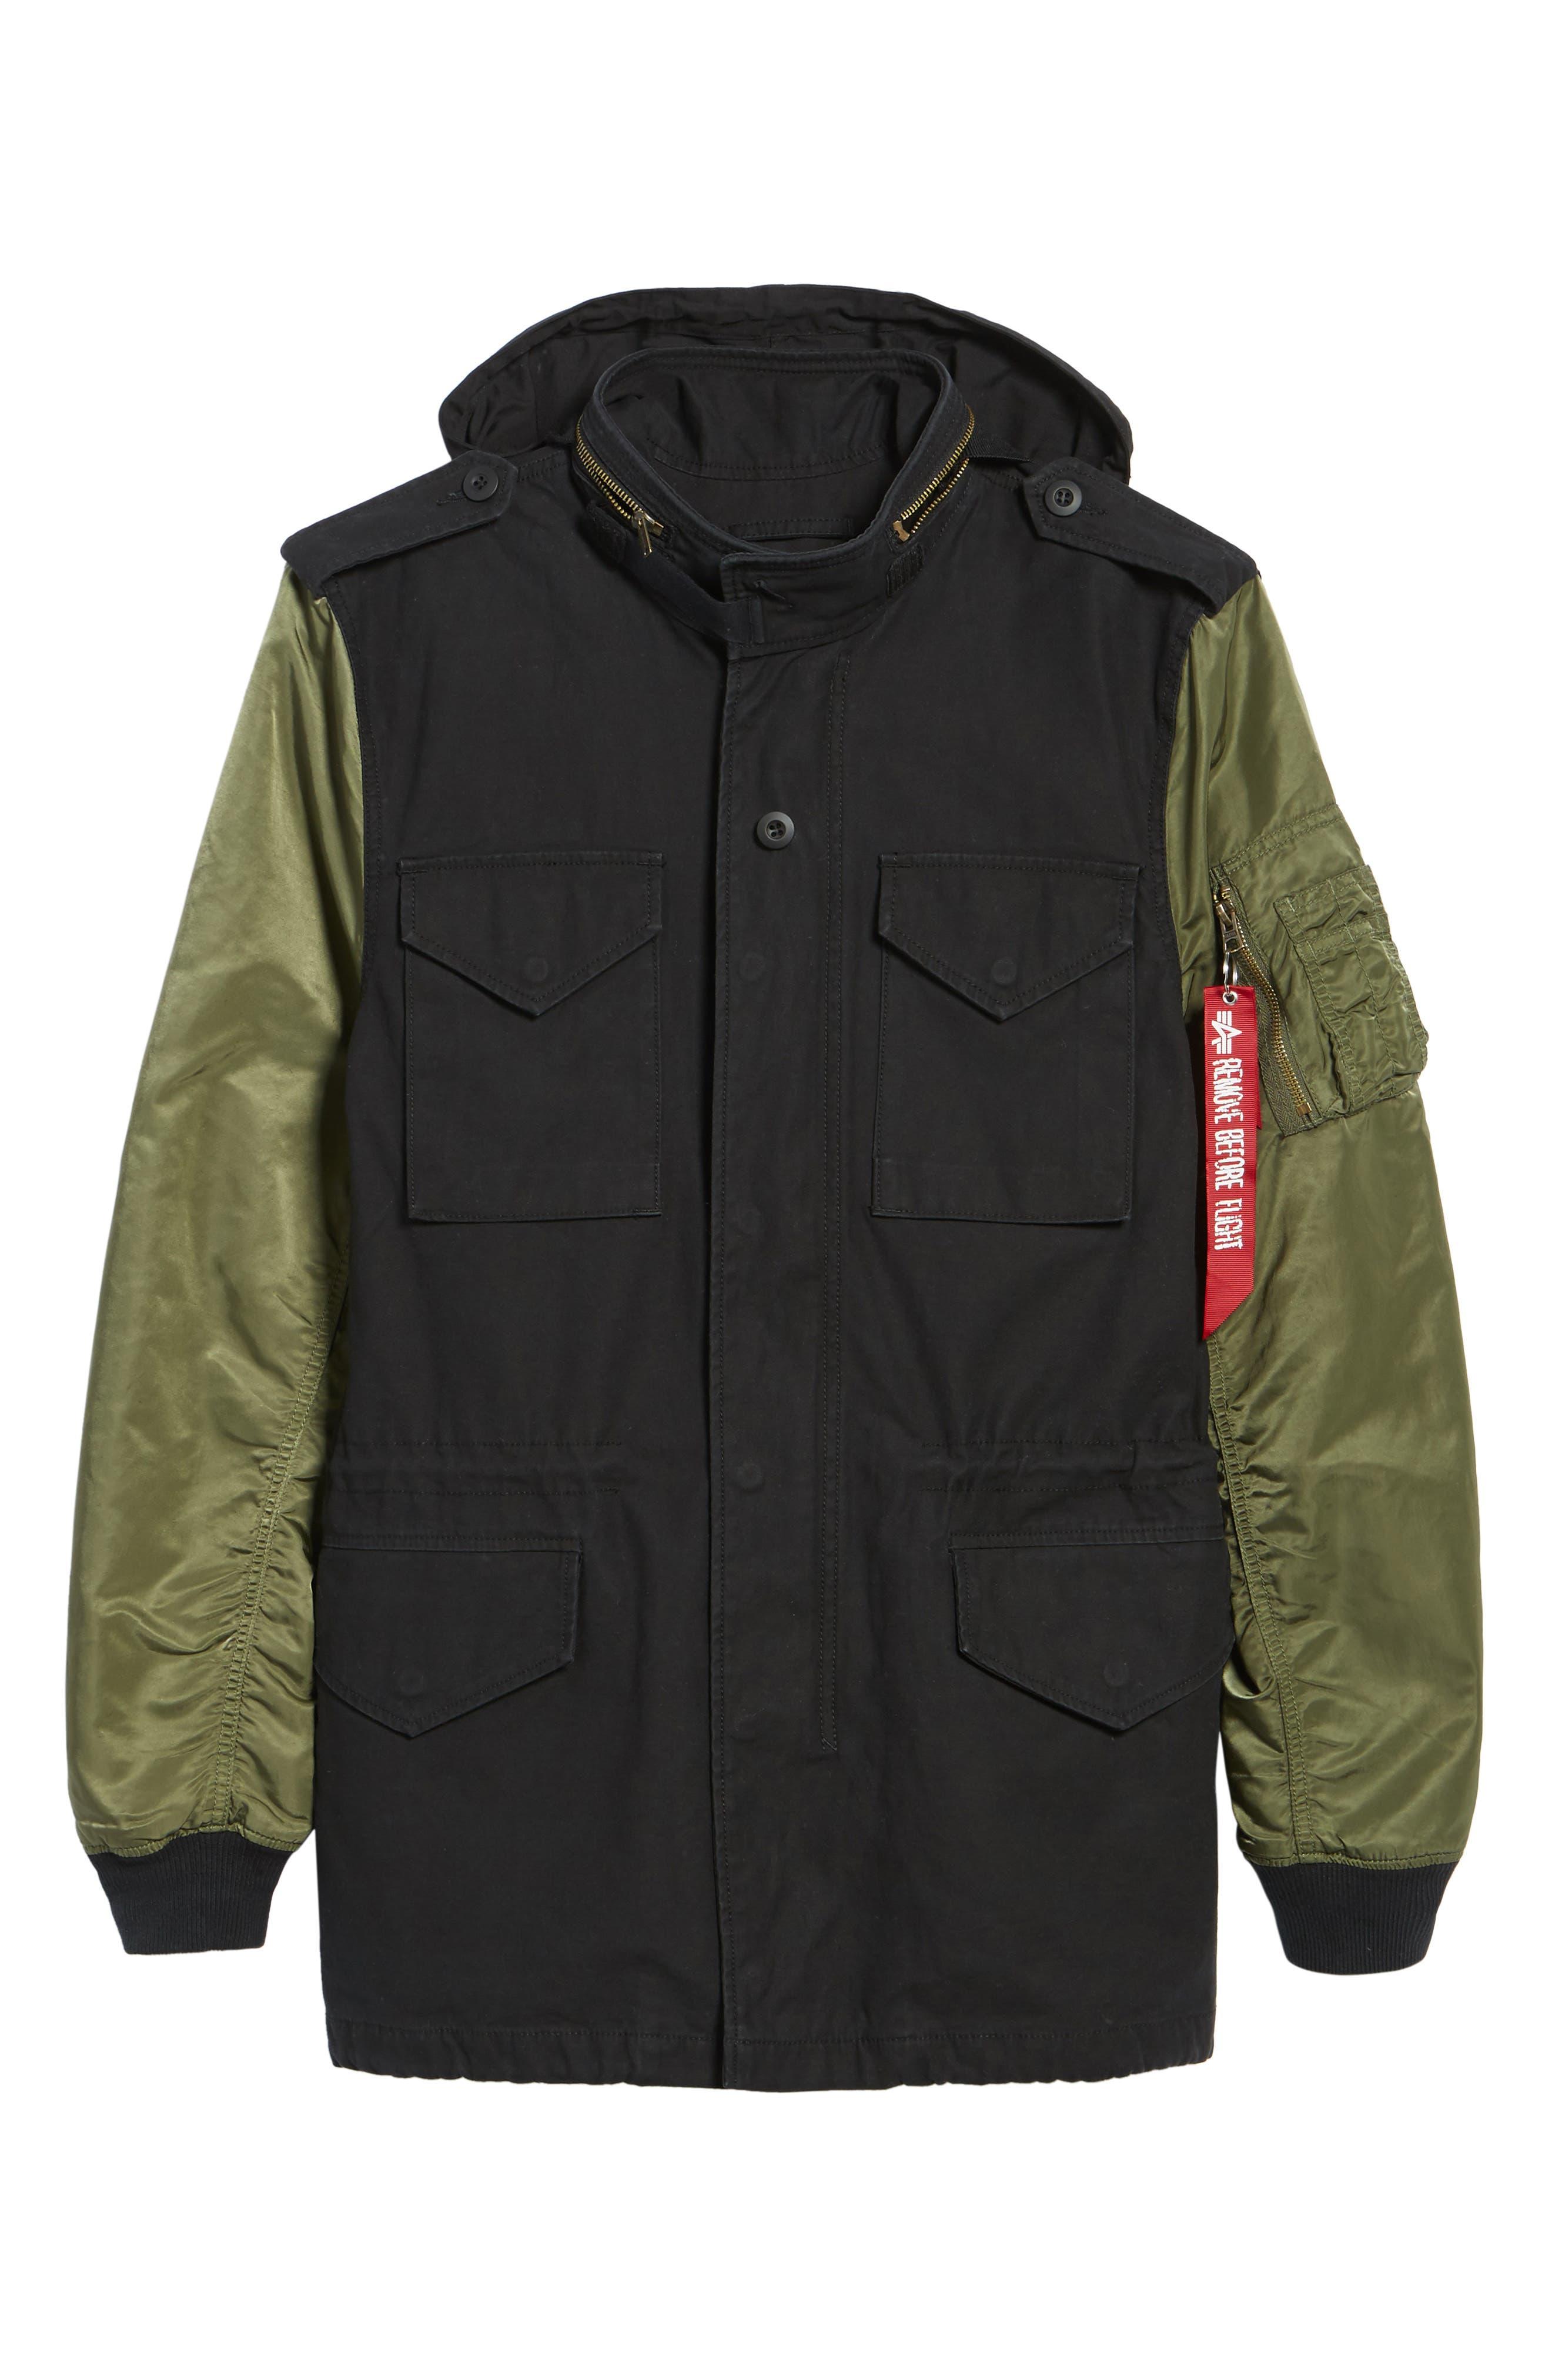 Fusion Field Coat,                             Alternate thumbnail 6, color,                             Black/ Sage